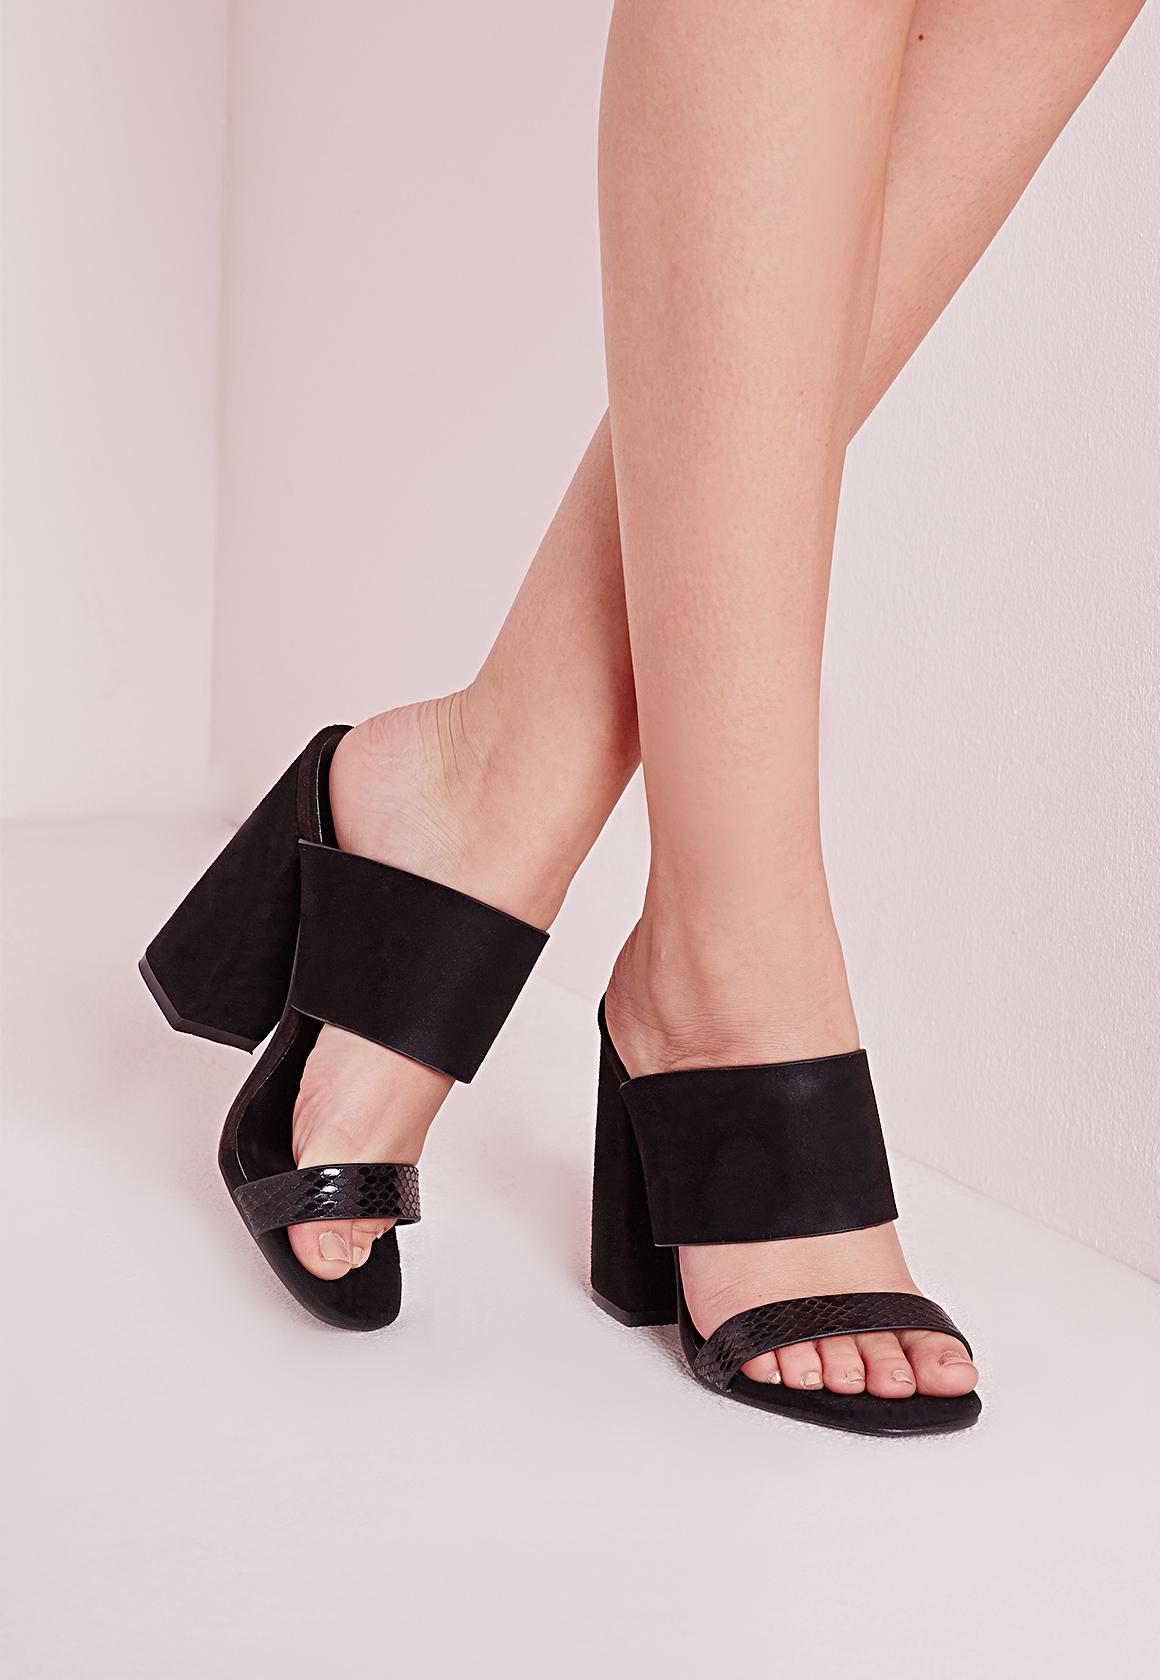 eb91f57154e Lyst - Missguided Double Strap Block Heel Mules Black in Black